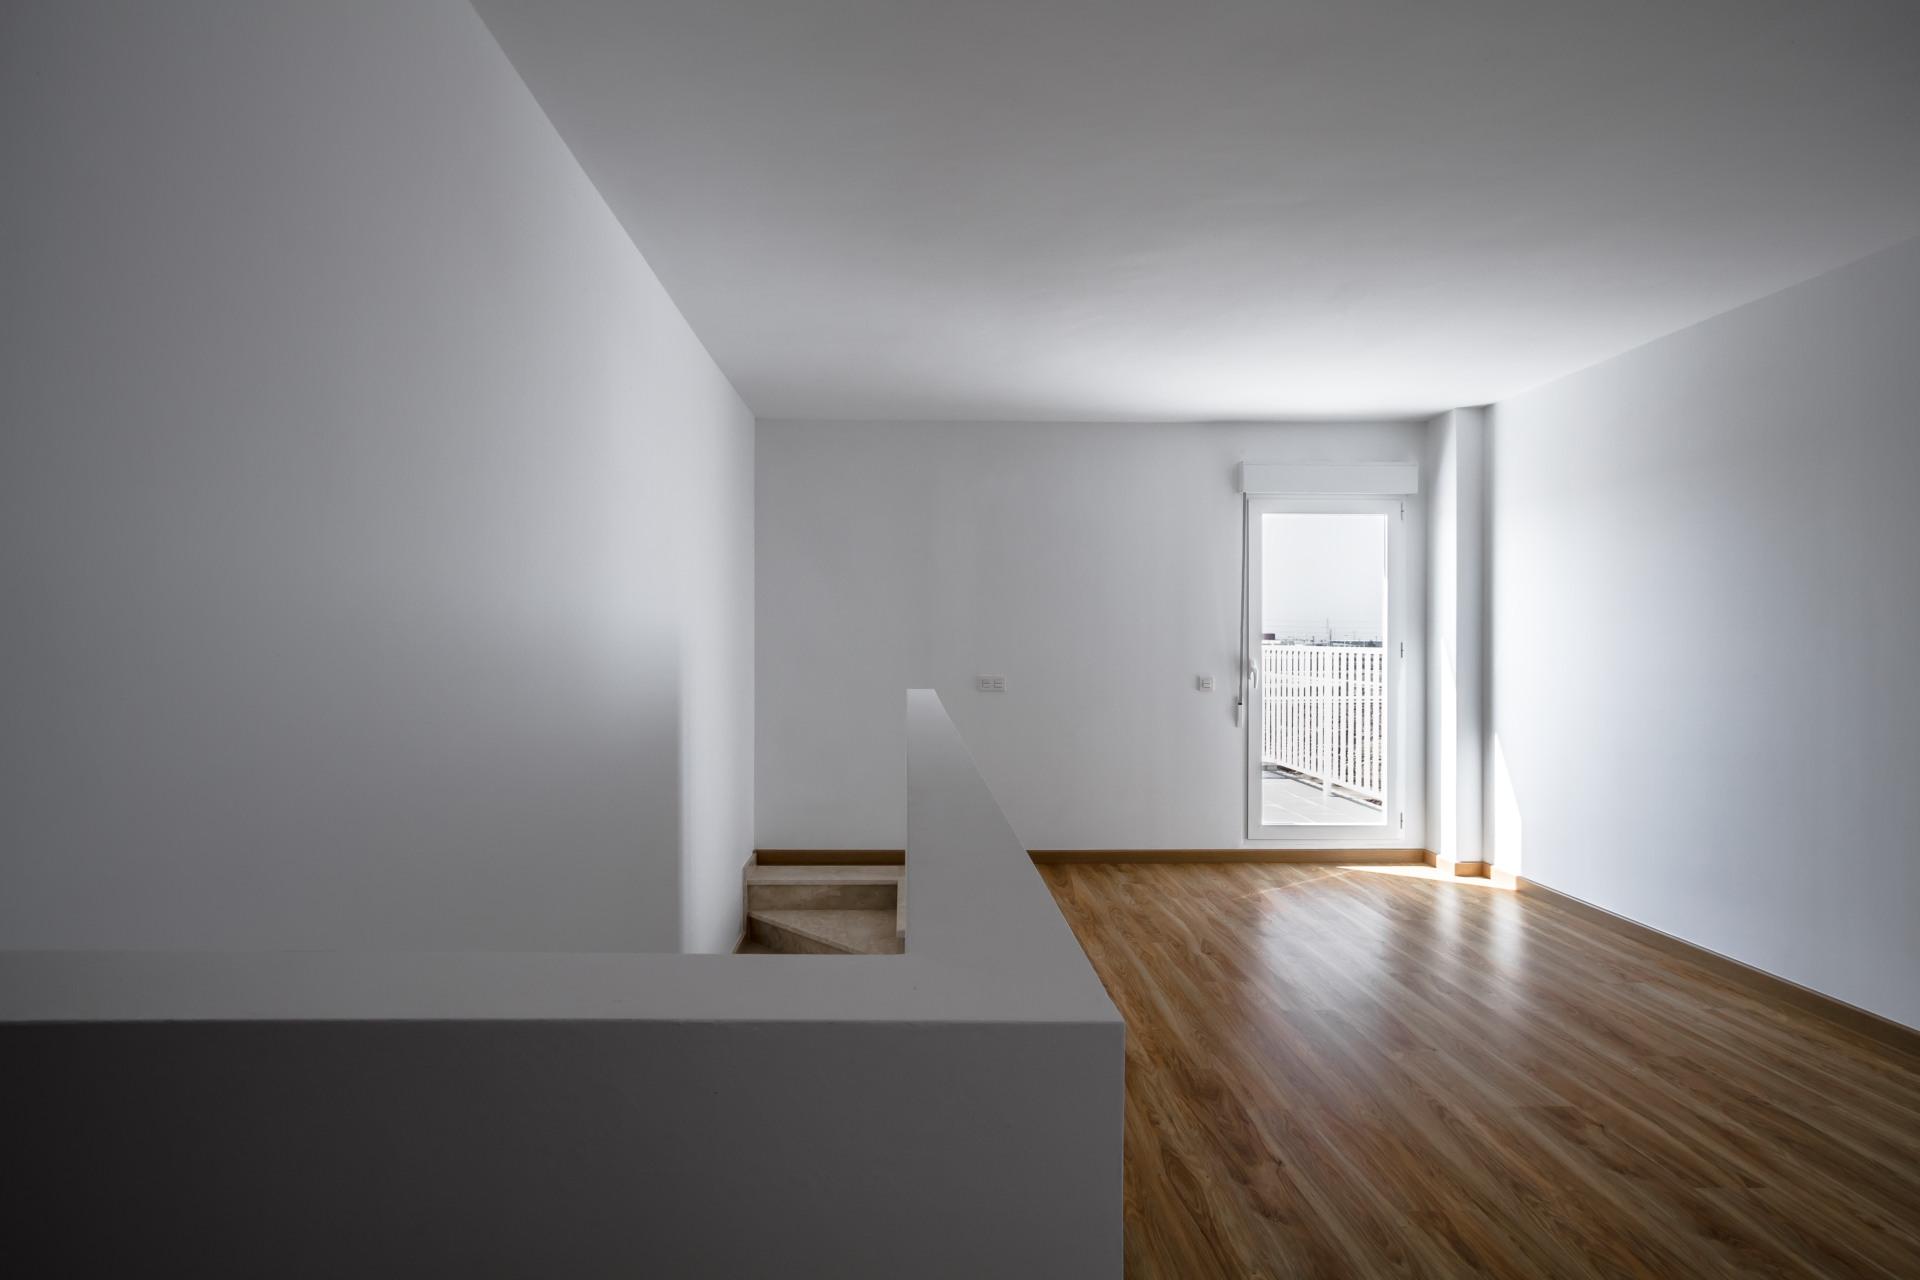 fotografia-arquitectura-valencia-german-cabo-viraje-sagunto (17)